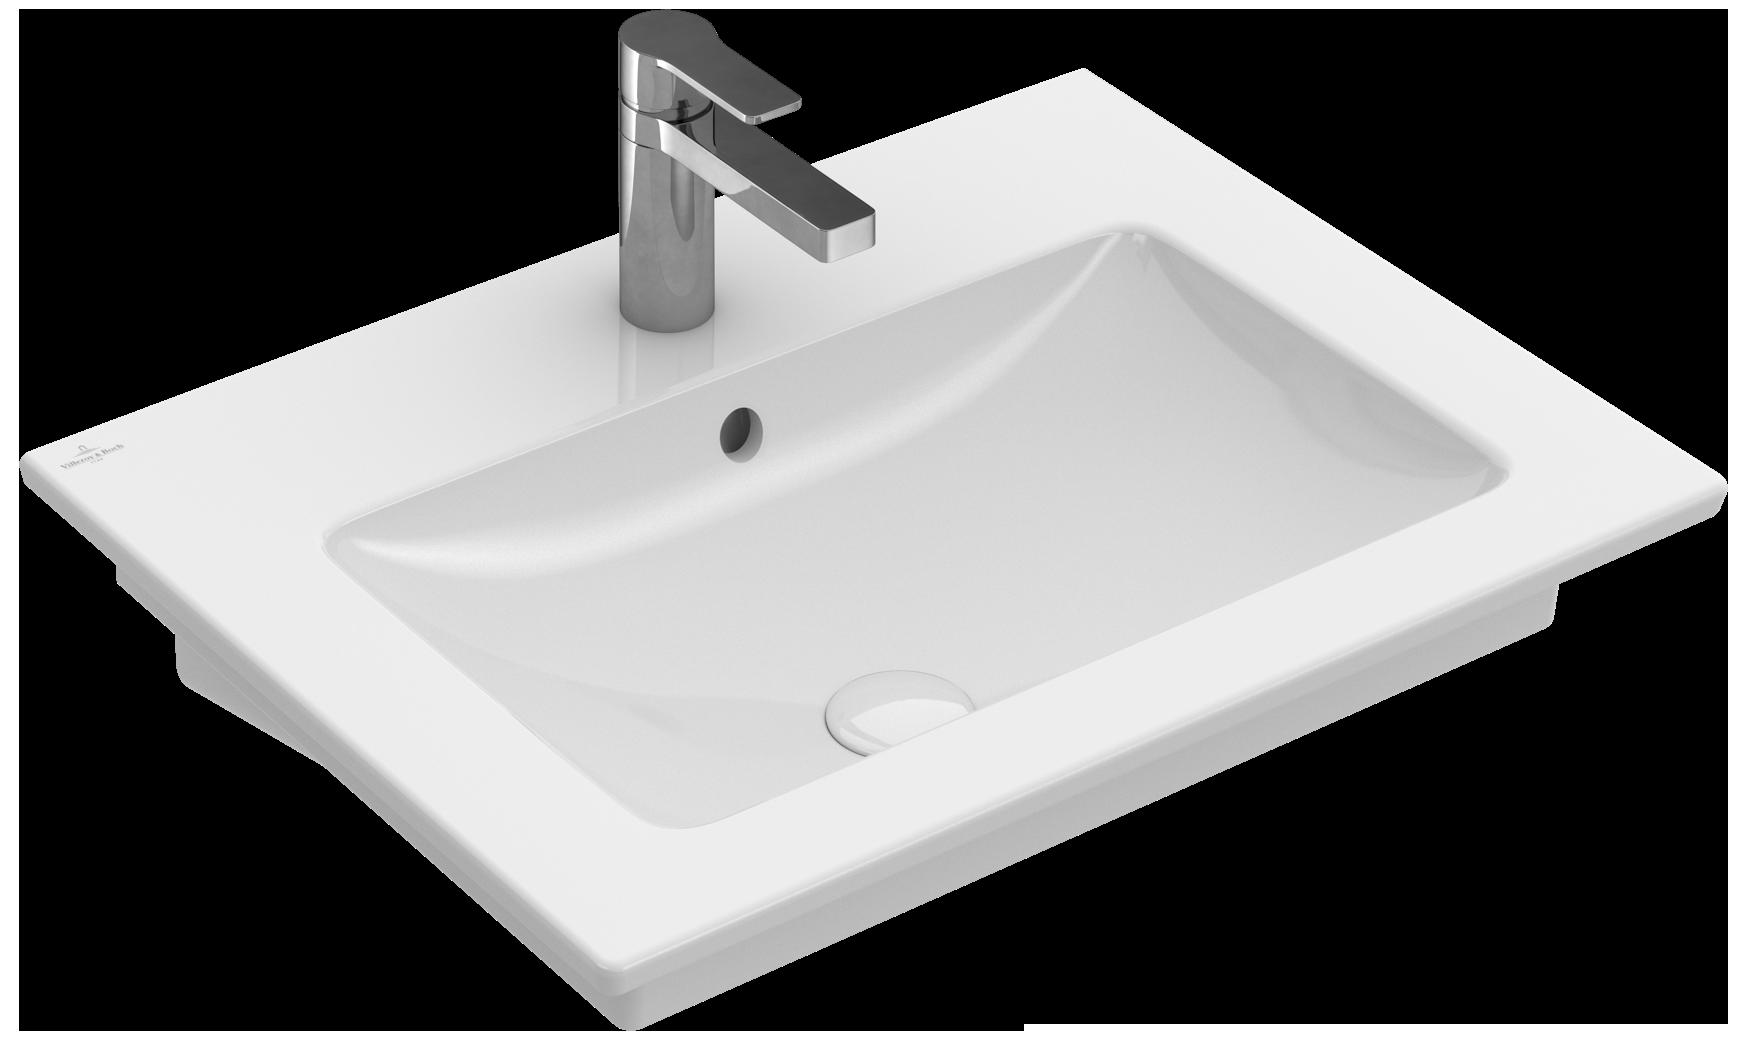 venticello washbasin 24 angular 4124u1 villeroy boch. Black Bedroom Furniture Sets. Home Design Ideas